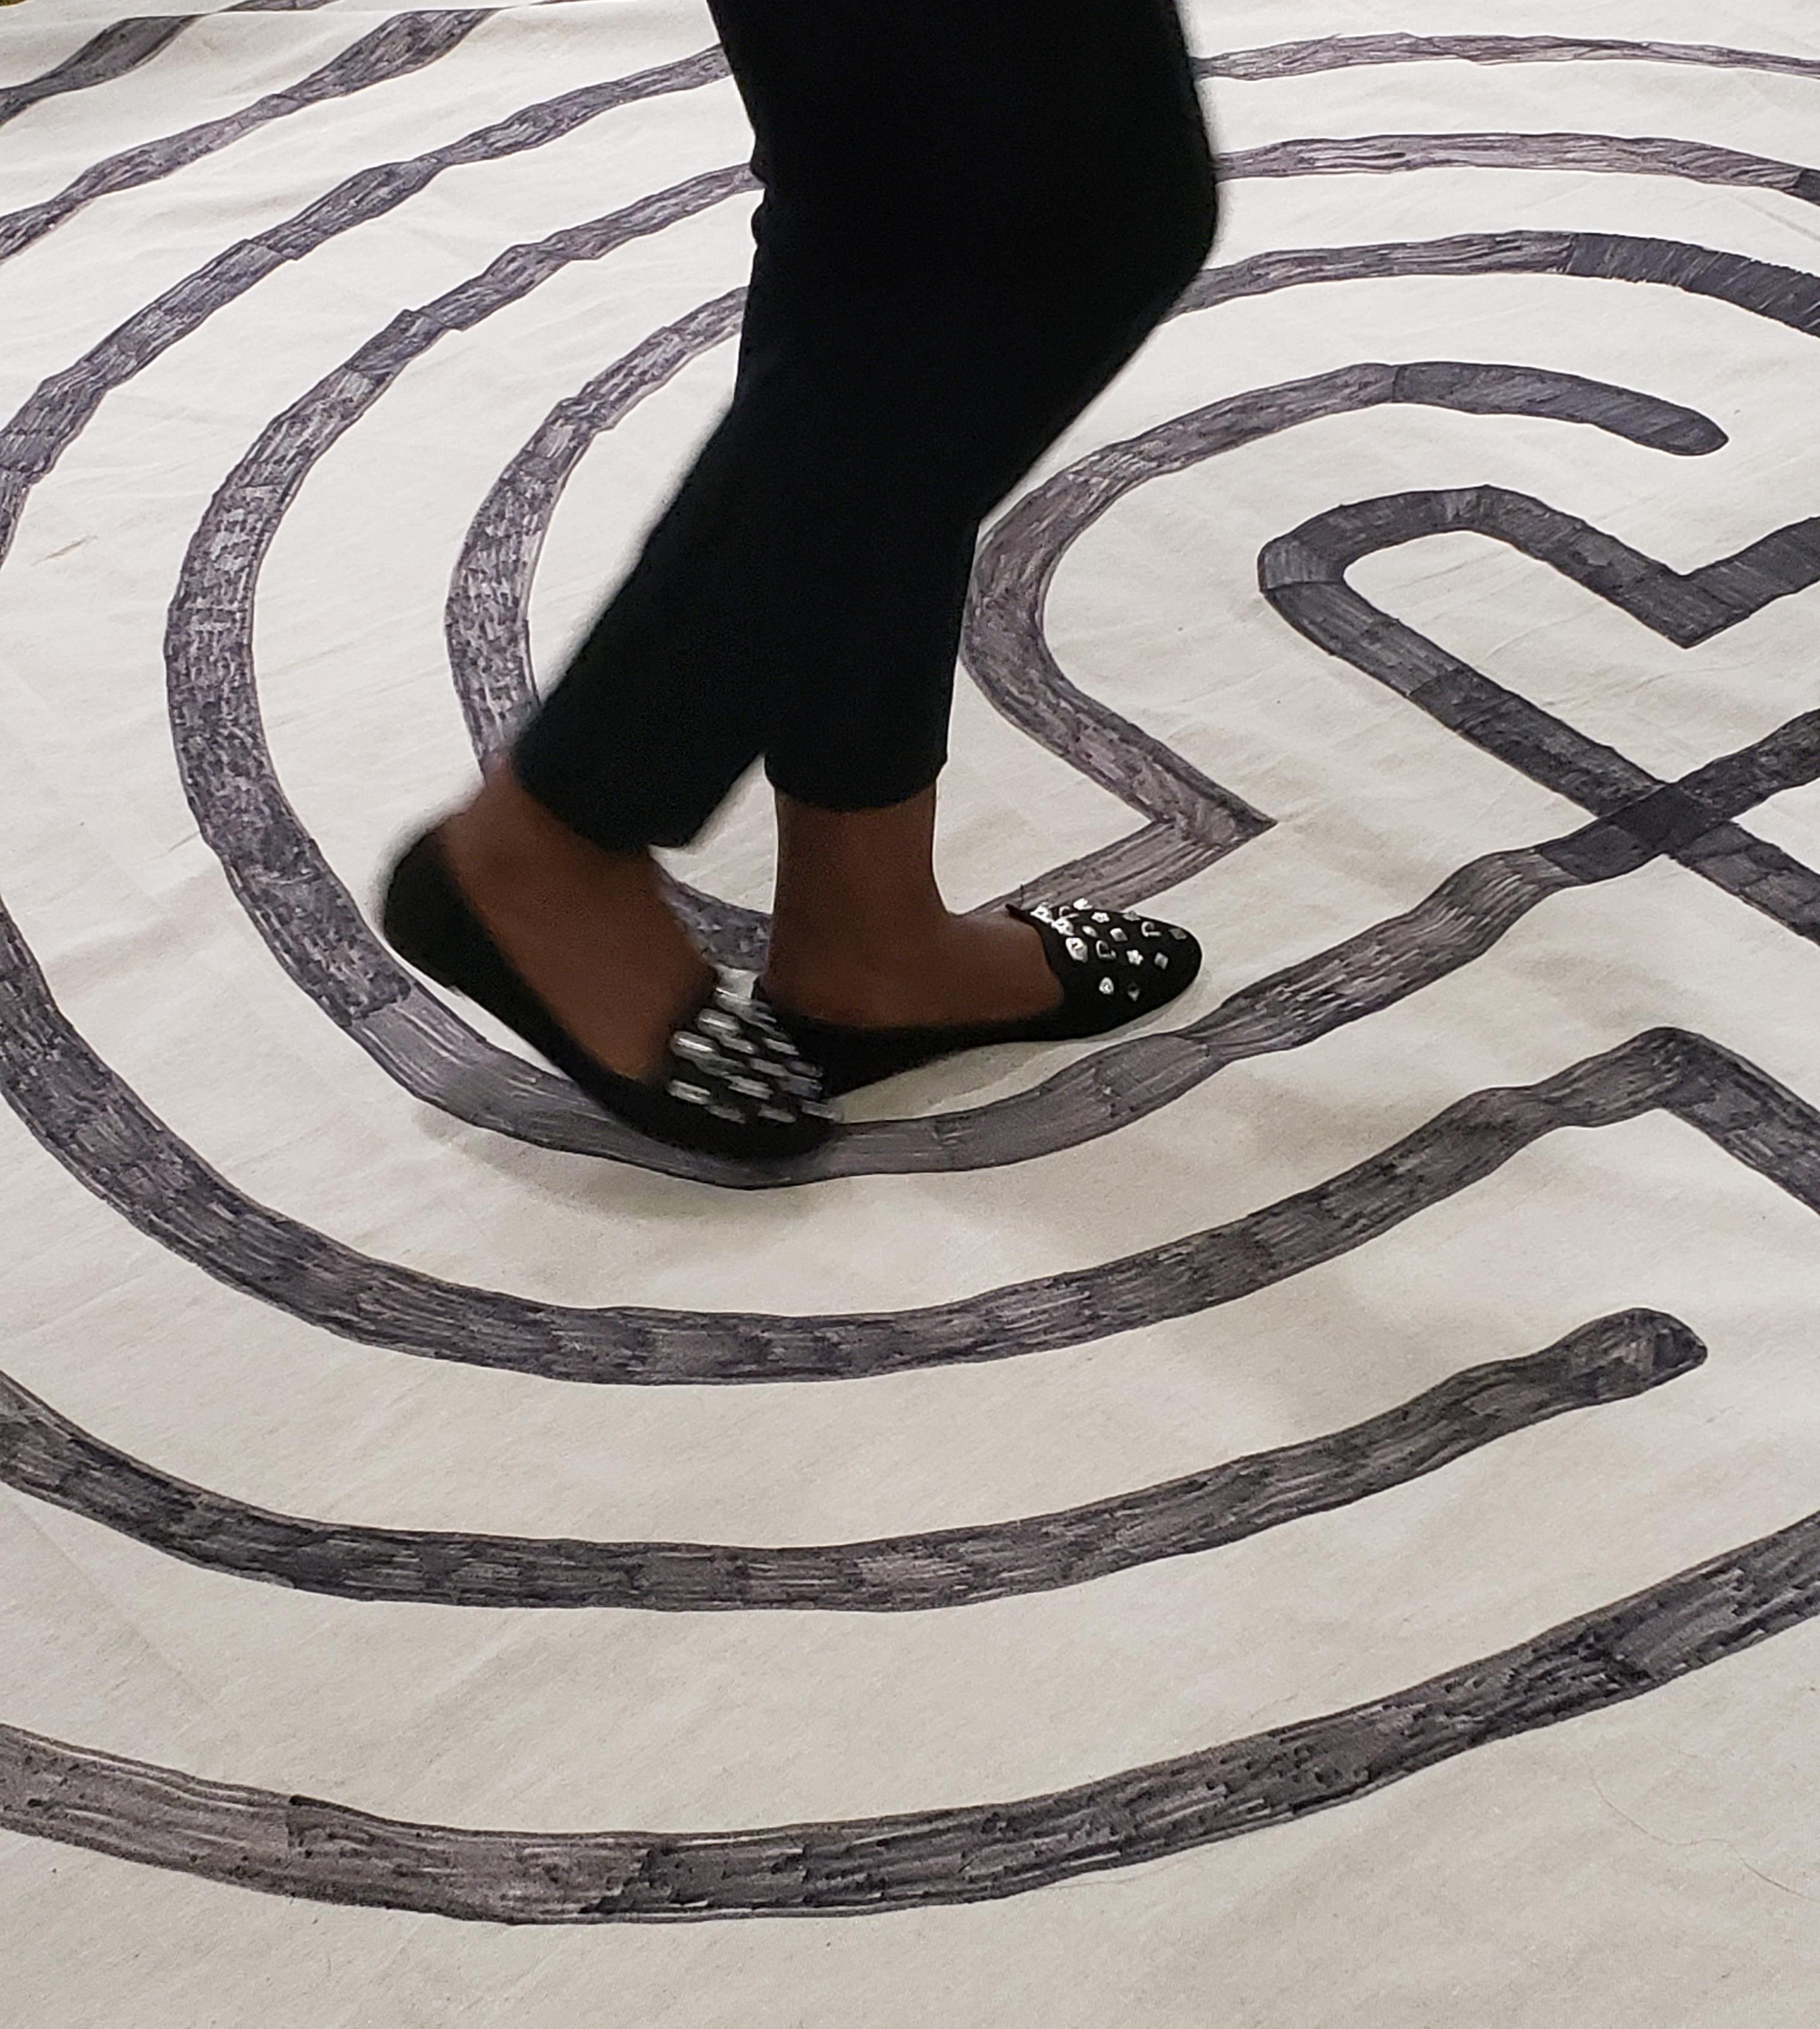 Stress Relief Week - Labyrinth Walk